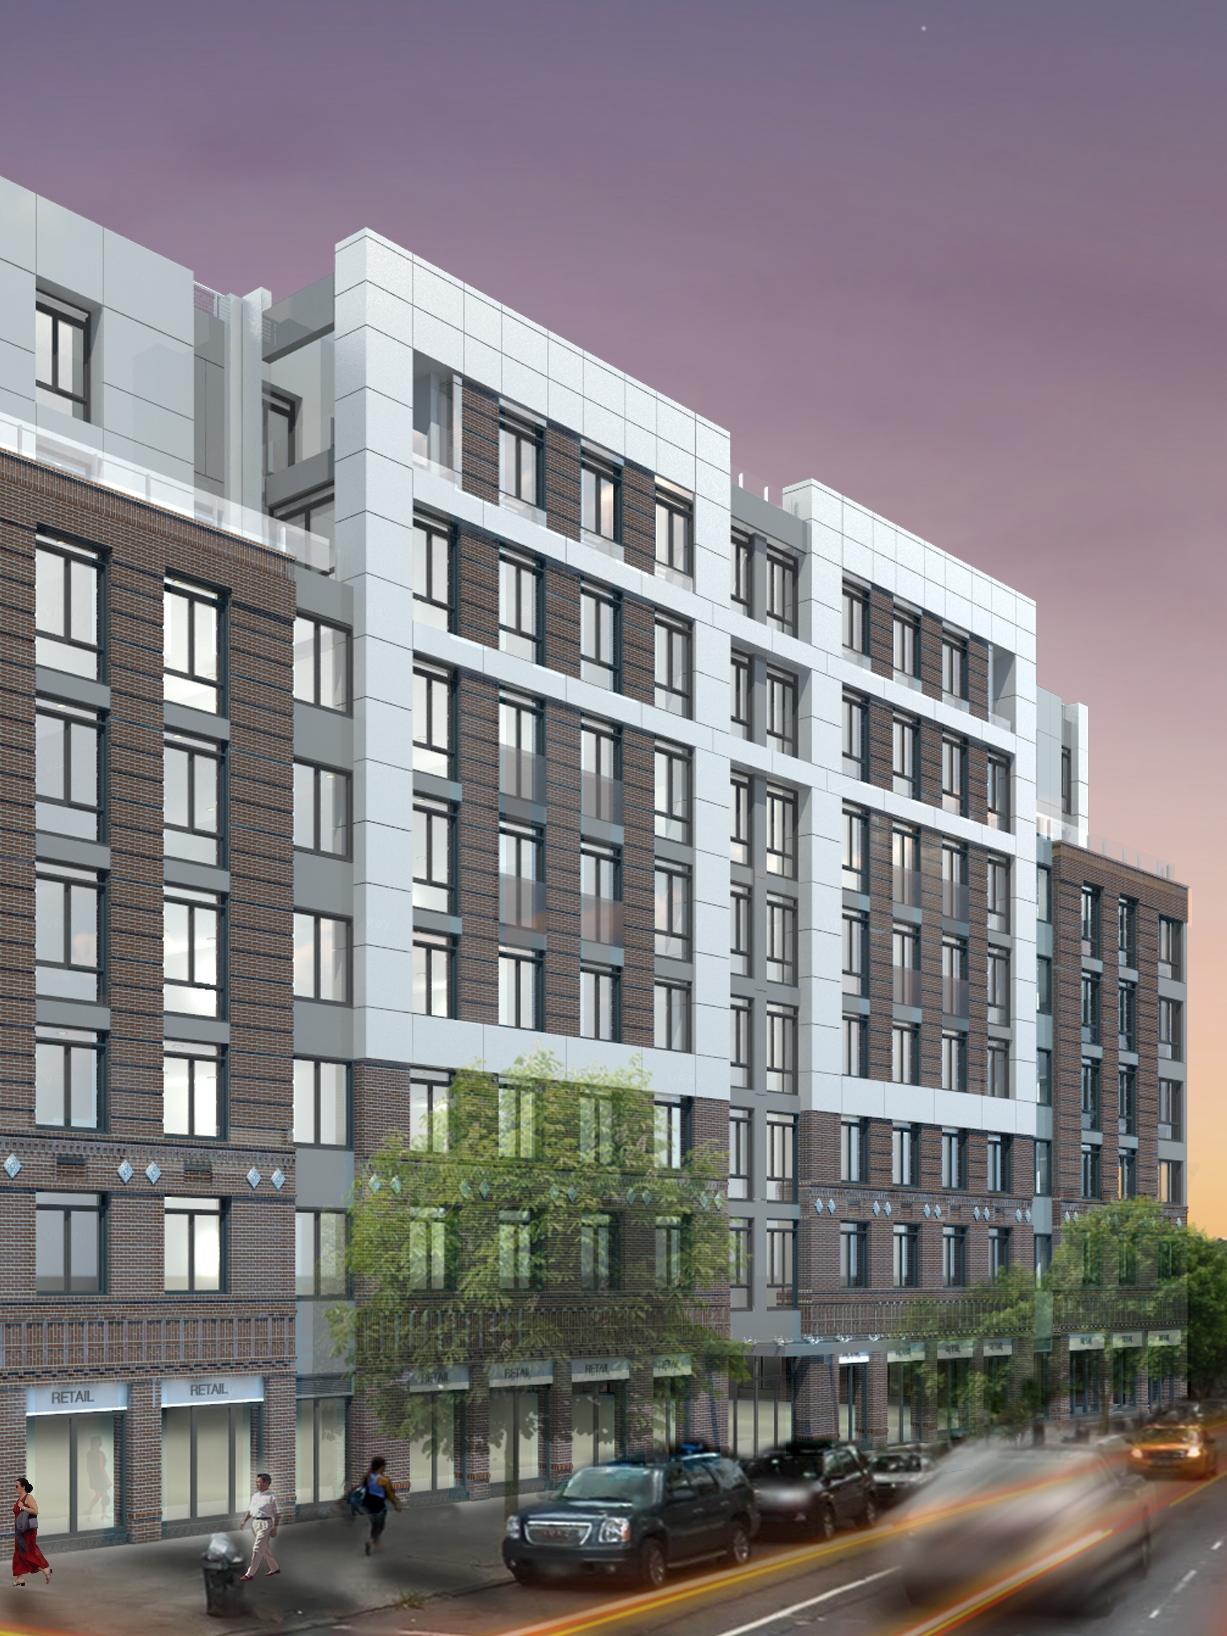 The Rennie, 2351 Adam Clayton Powell Jr. Boulevard, NYC - Condo Apartments  | CityRealty